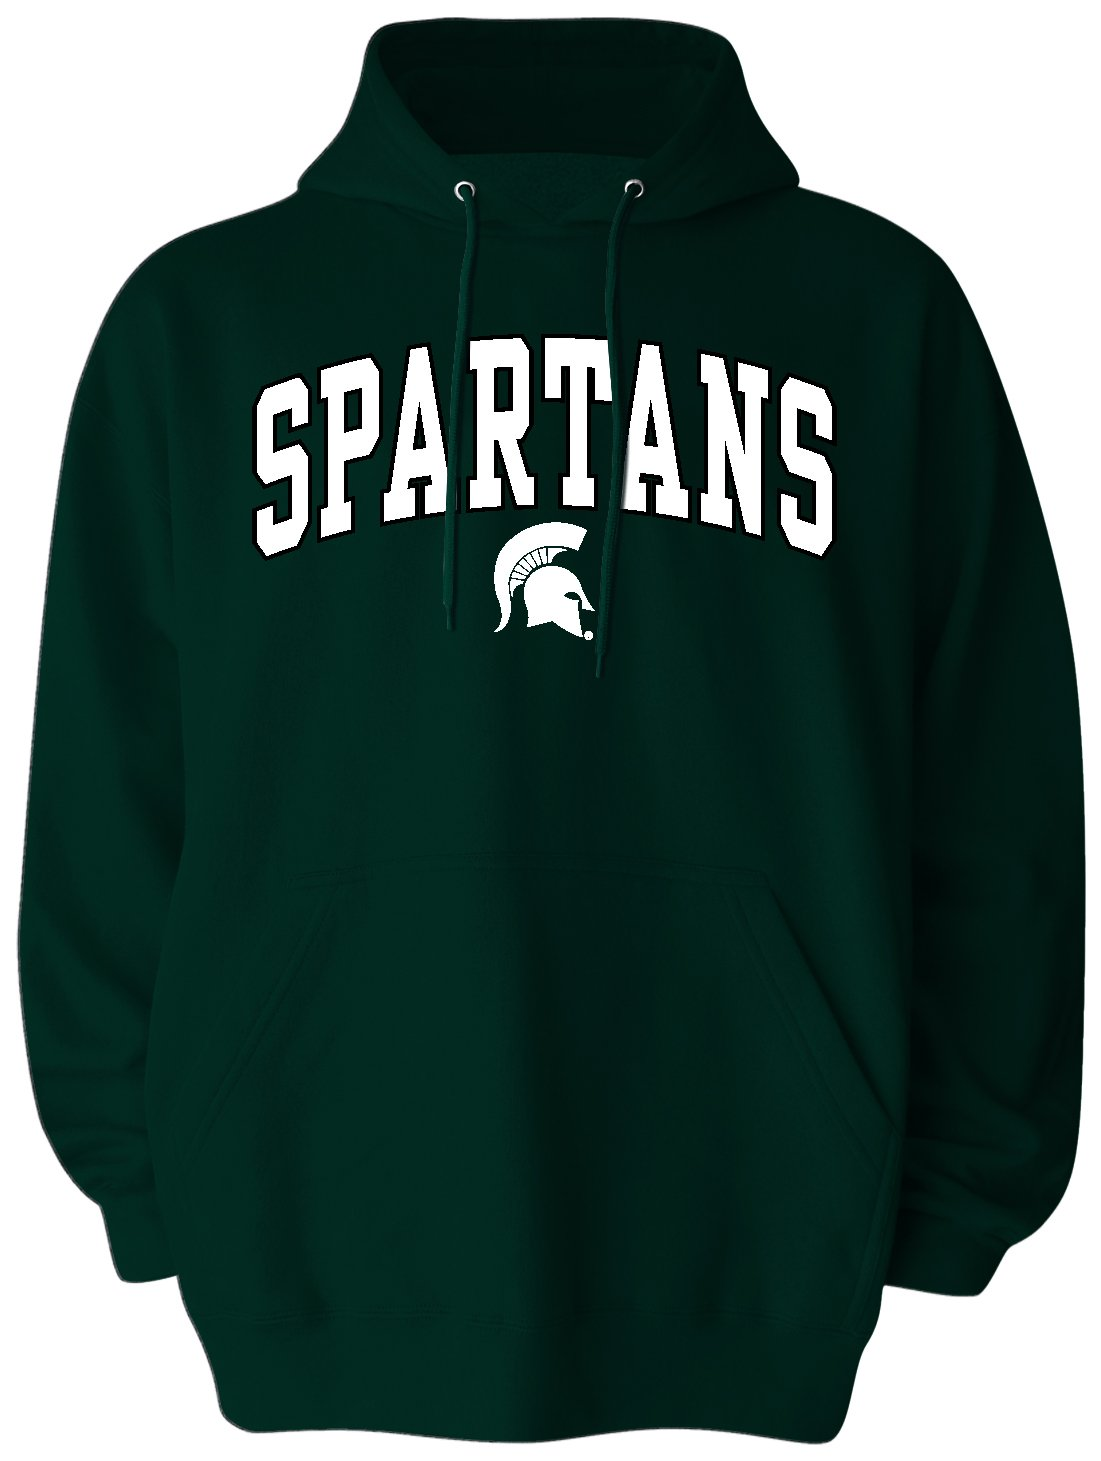 NCAA Michigan State Spartansメンズビッグプルオーバーパーカー、3 x l、Spartanグリーン   B0734TM8NM